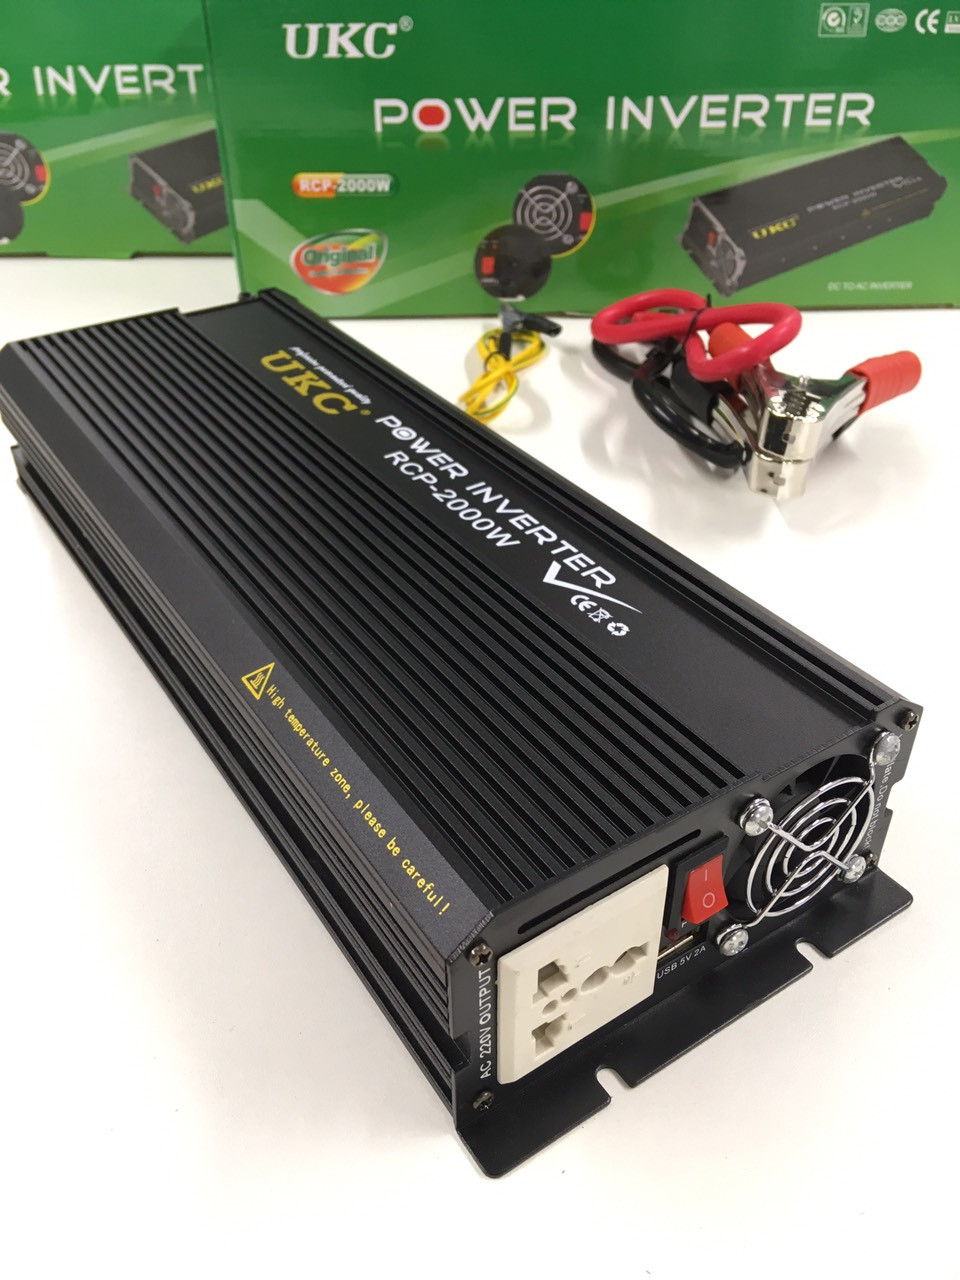 Преобразователь инвертор UKC Power Invertrer RCP-2000W 12v-220v